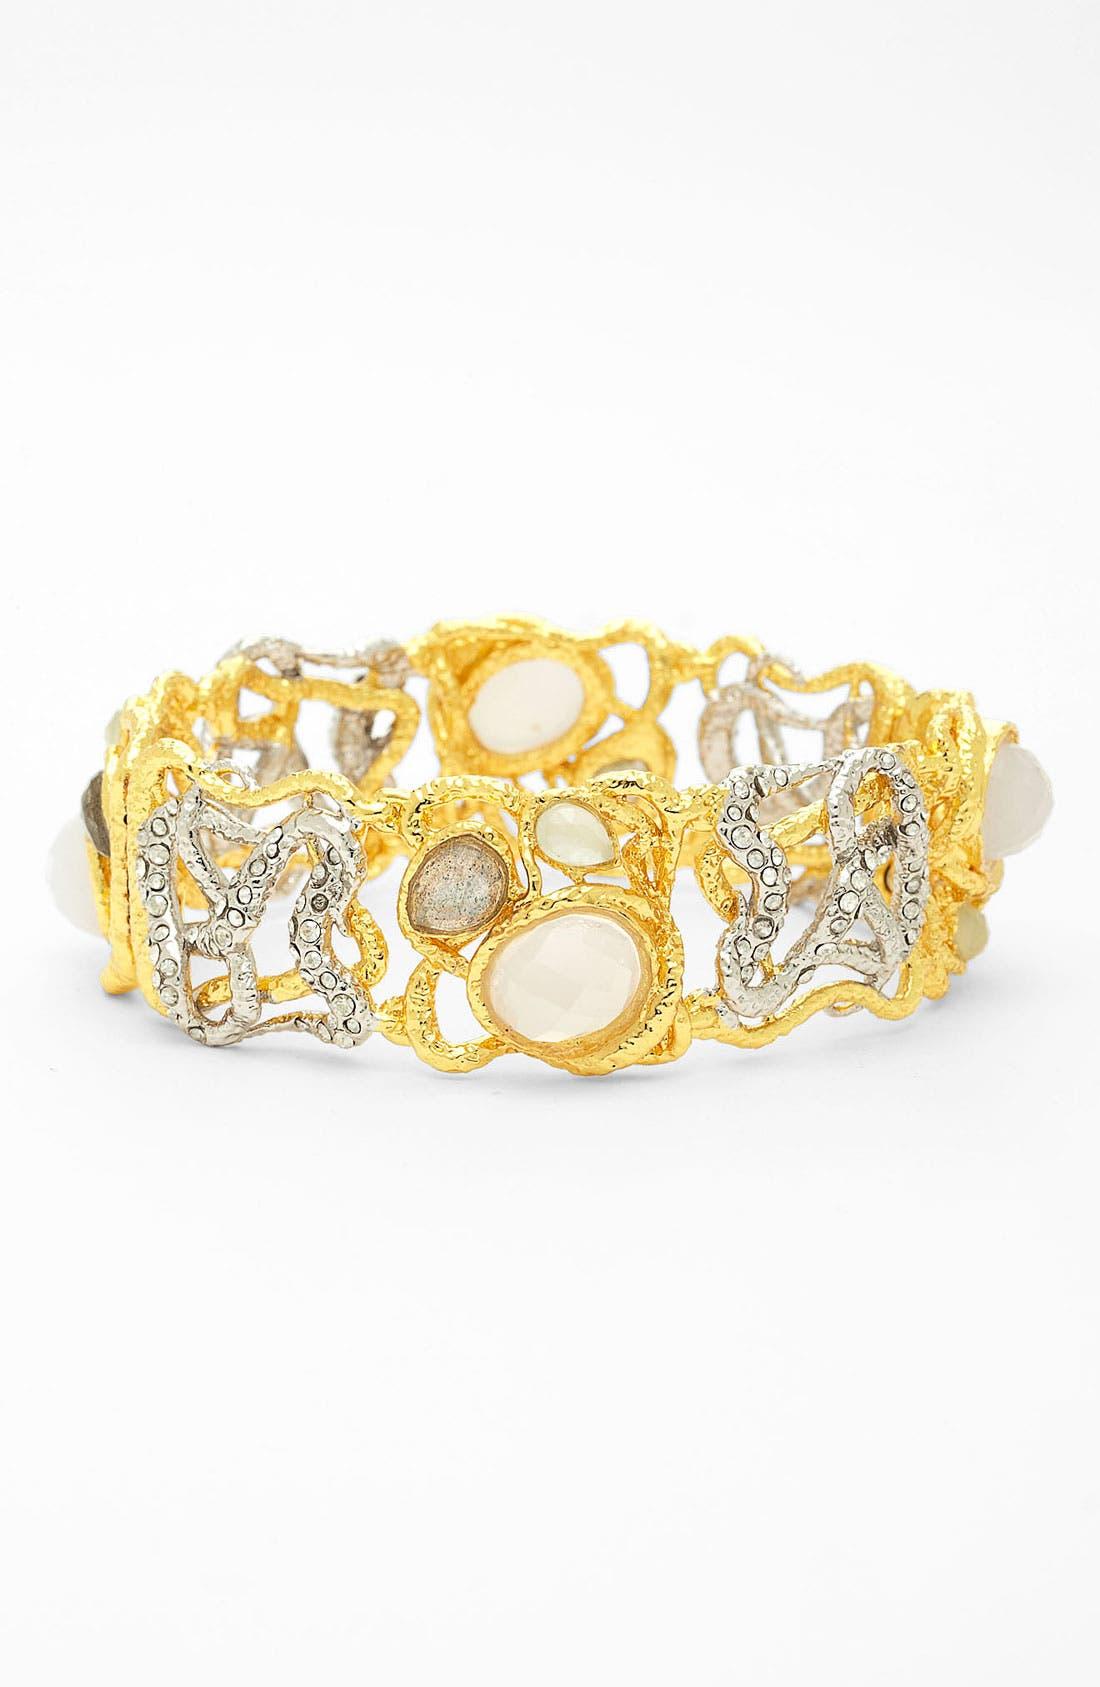 Main Image - Alexis Bittar 'Elements - Siyabona' Bracelet